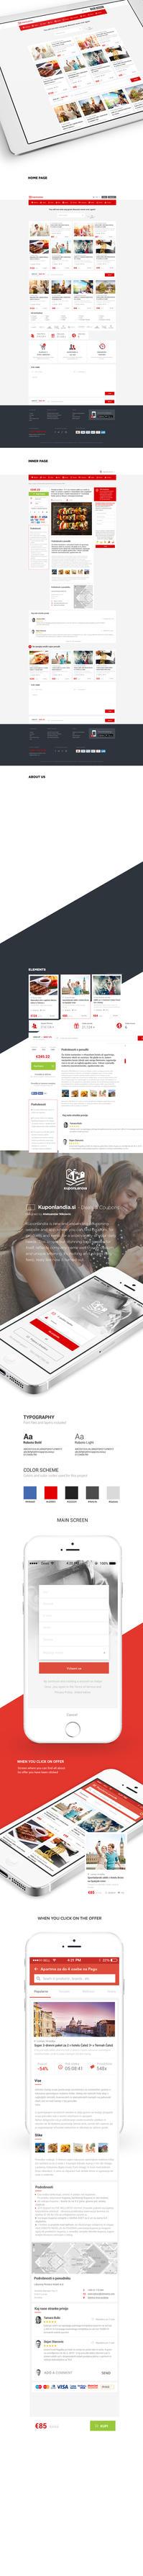 Kuponlandia.com Web - App Design by vasiligfx